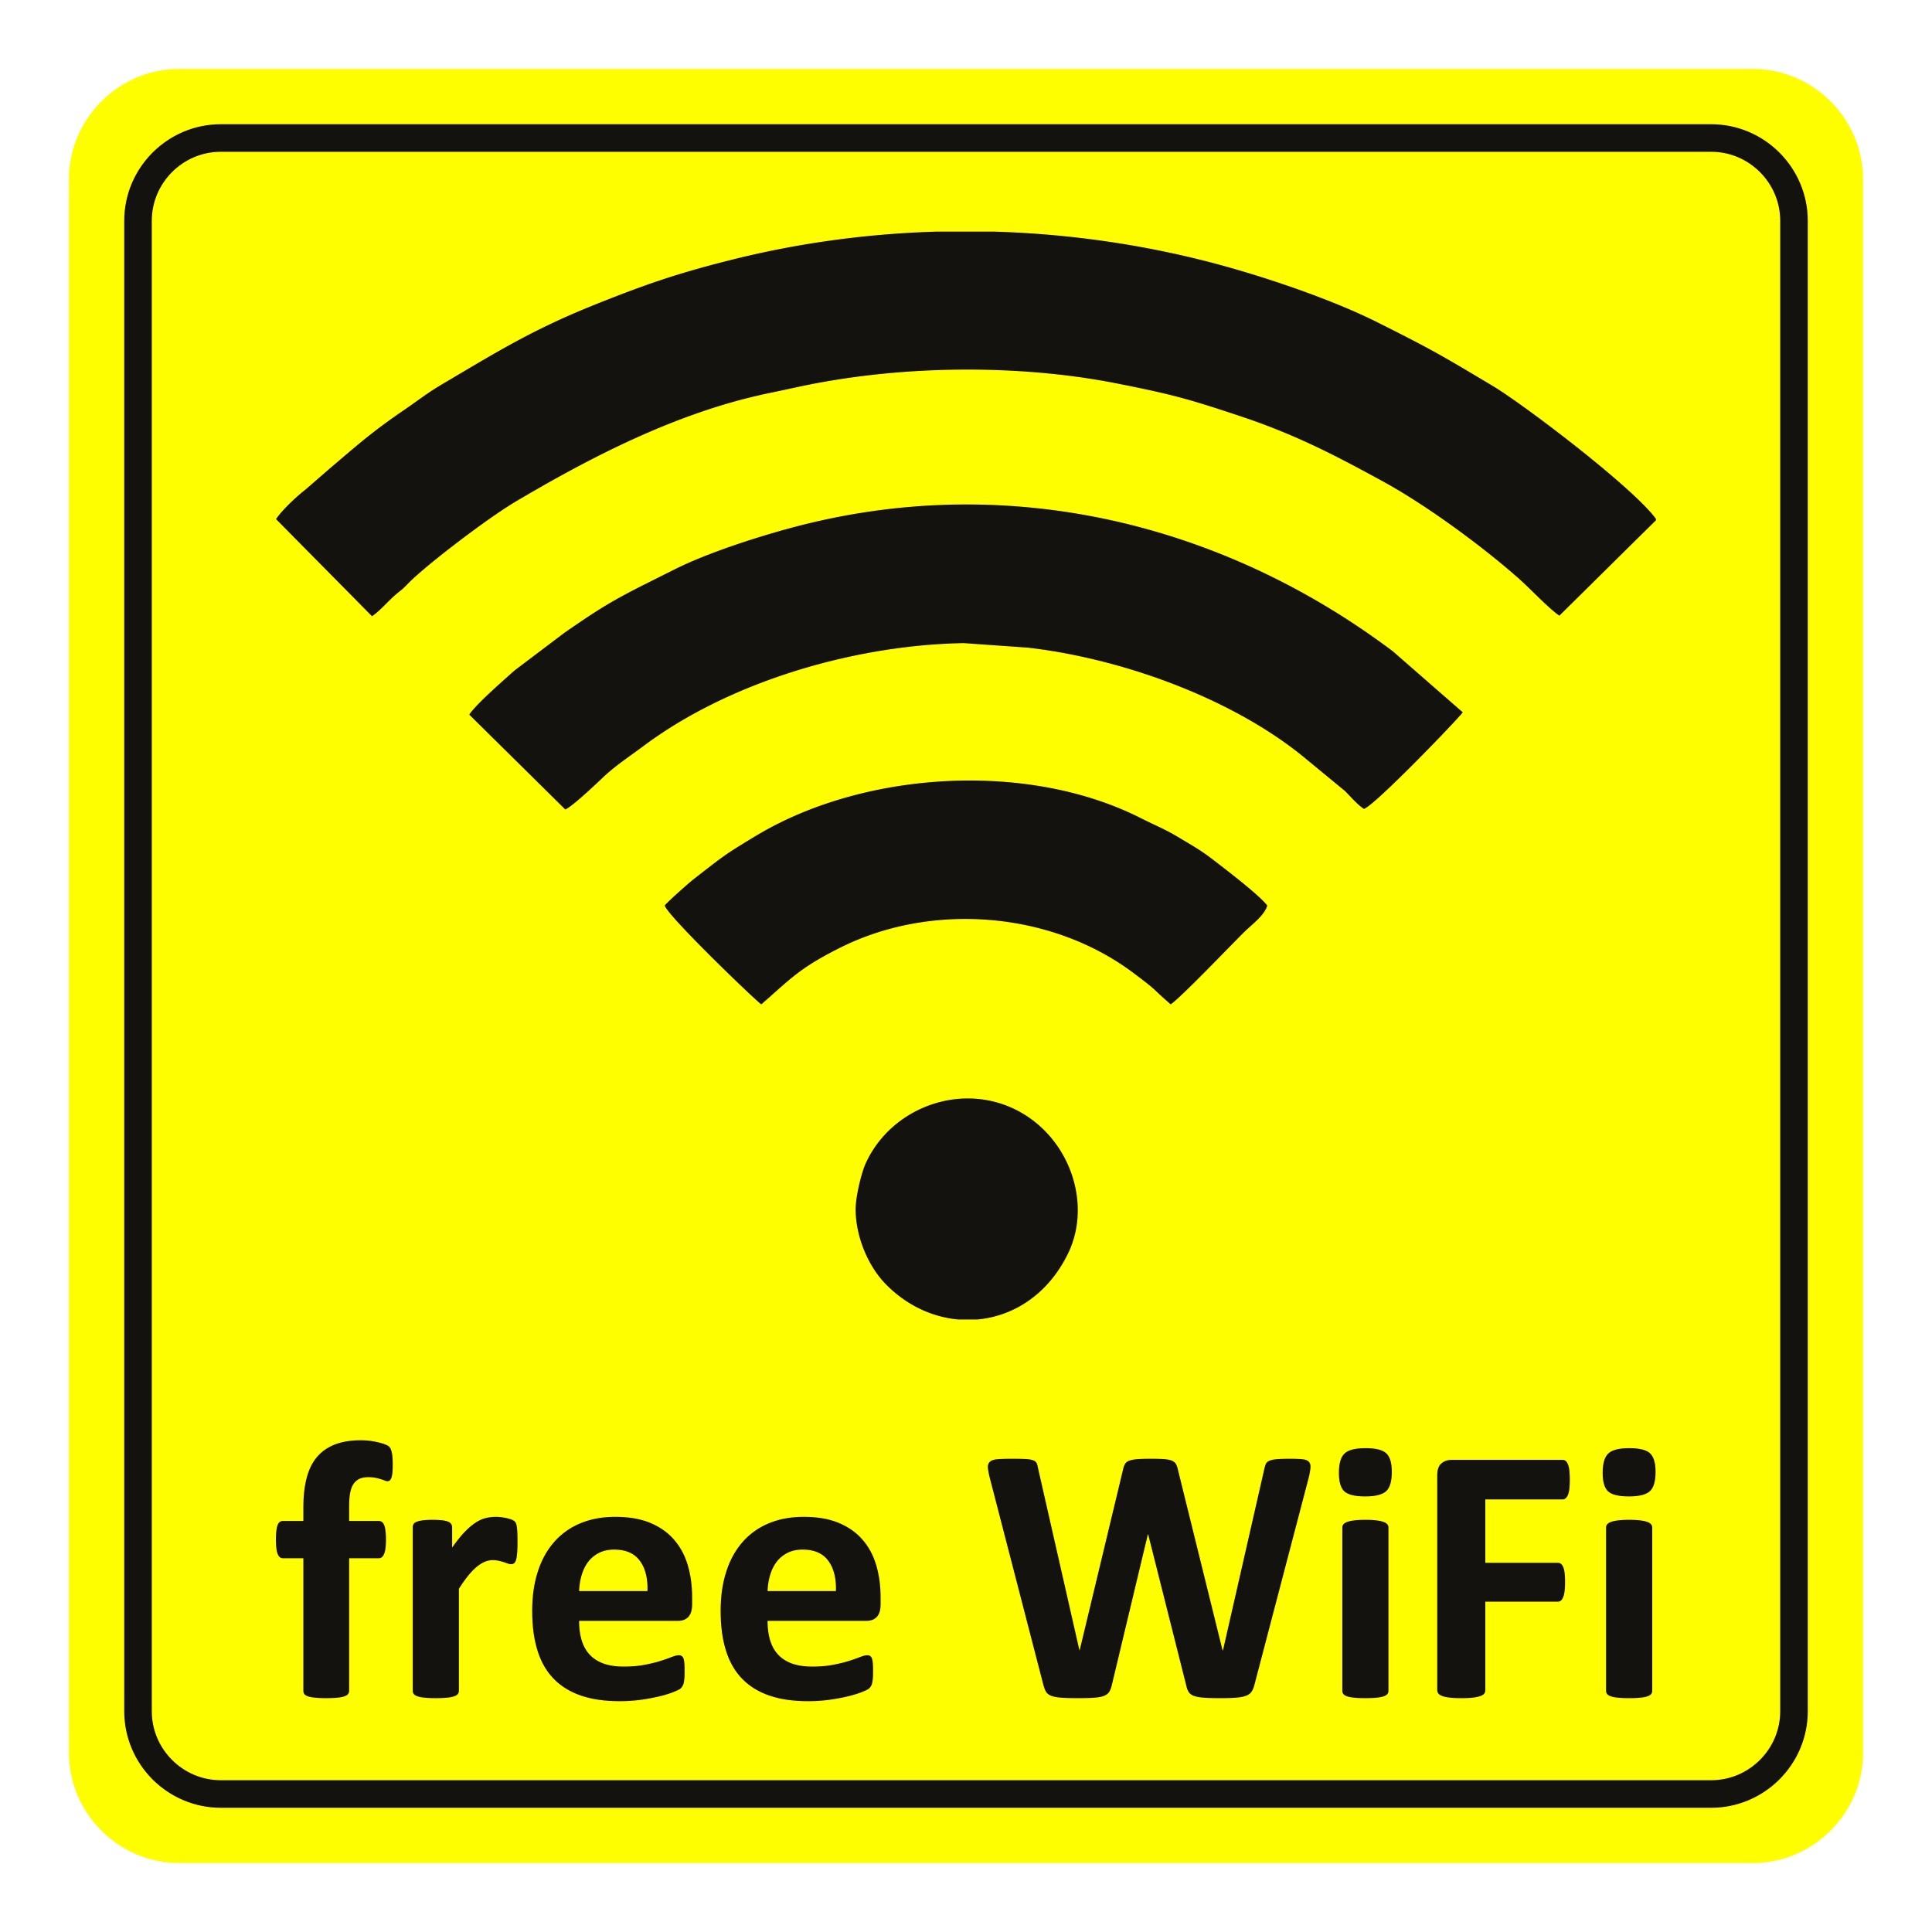 Aufkleber free WiFi gelb 65 x 65 mm – Bild 1